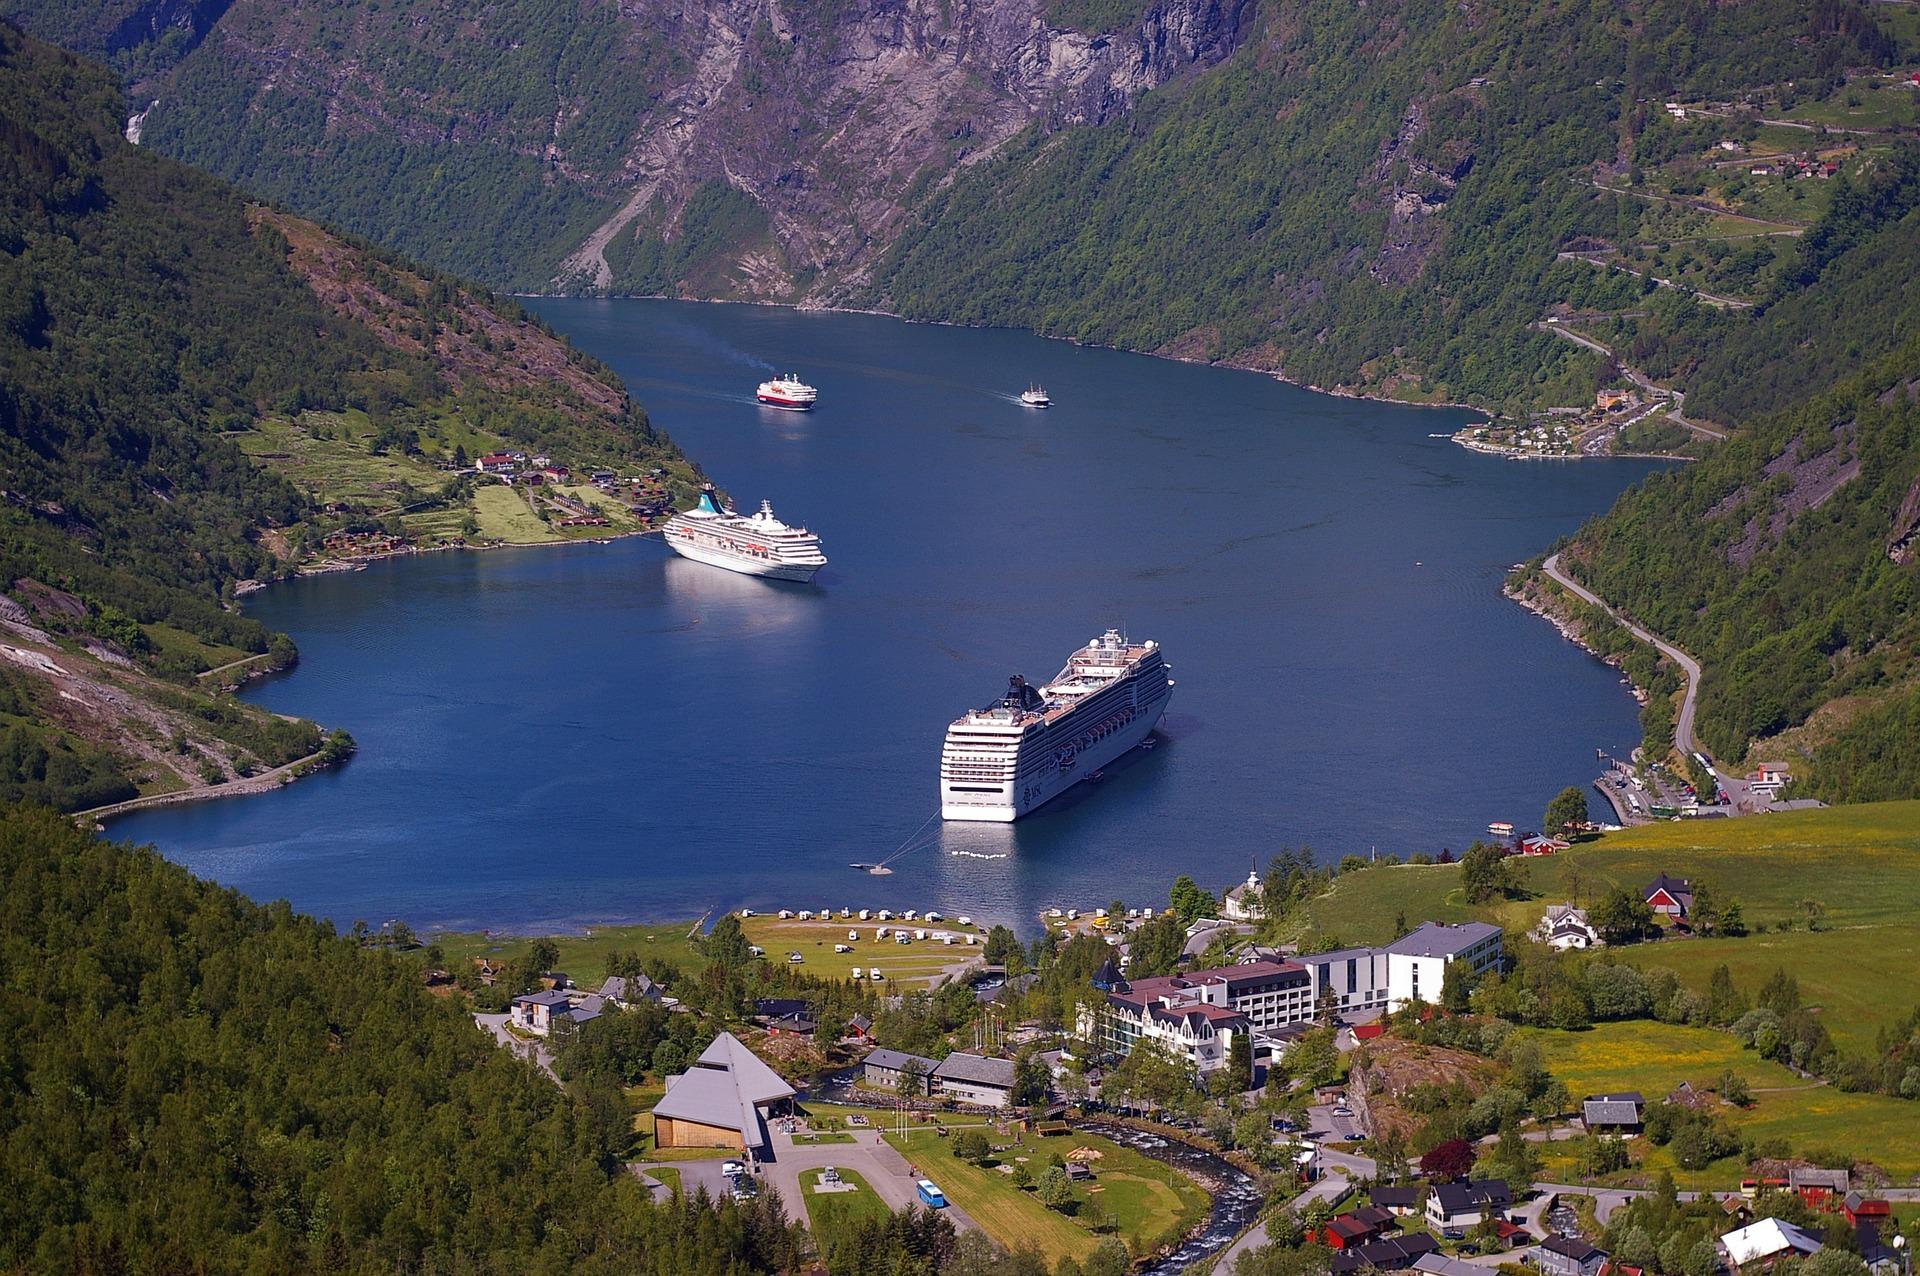 fjord-940524_1920